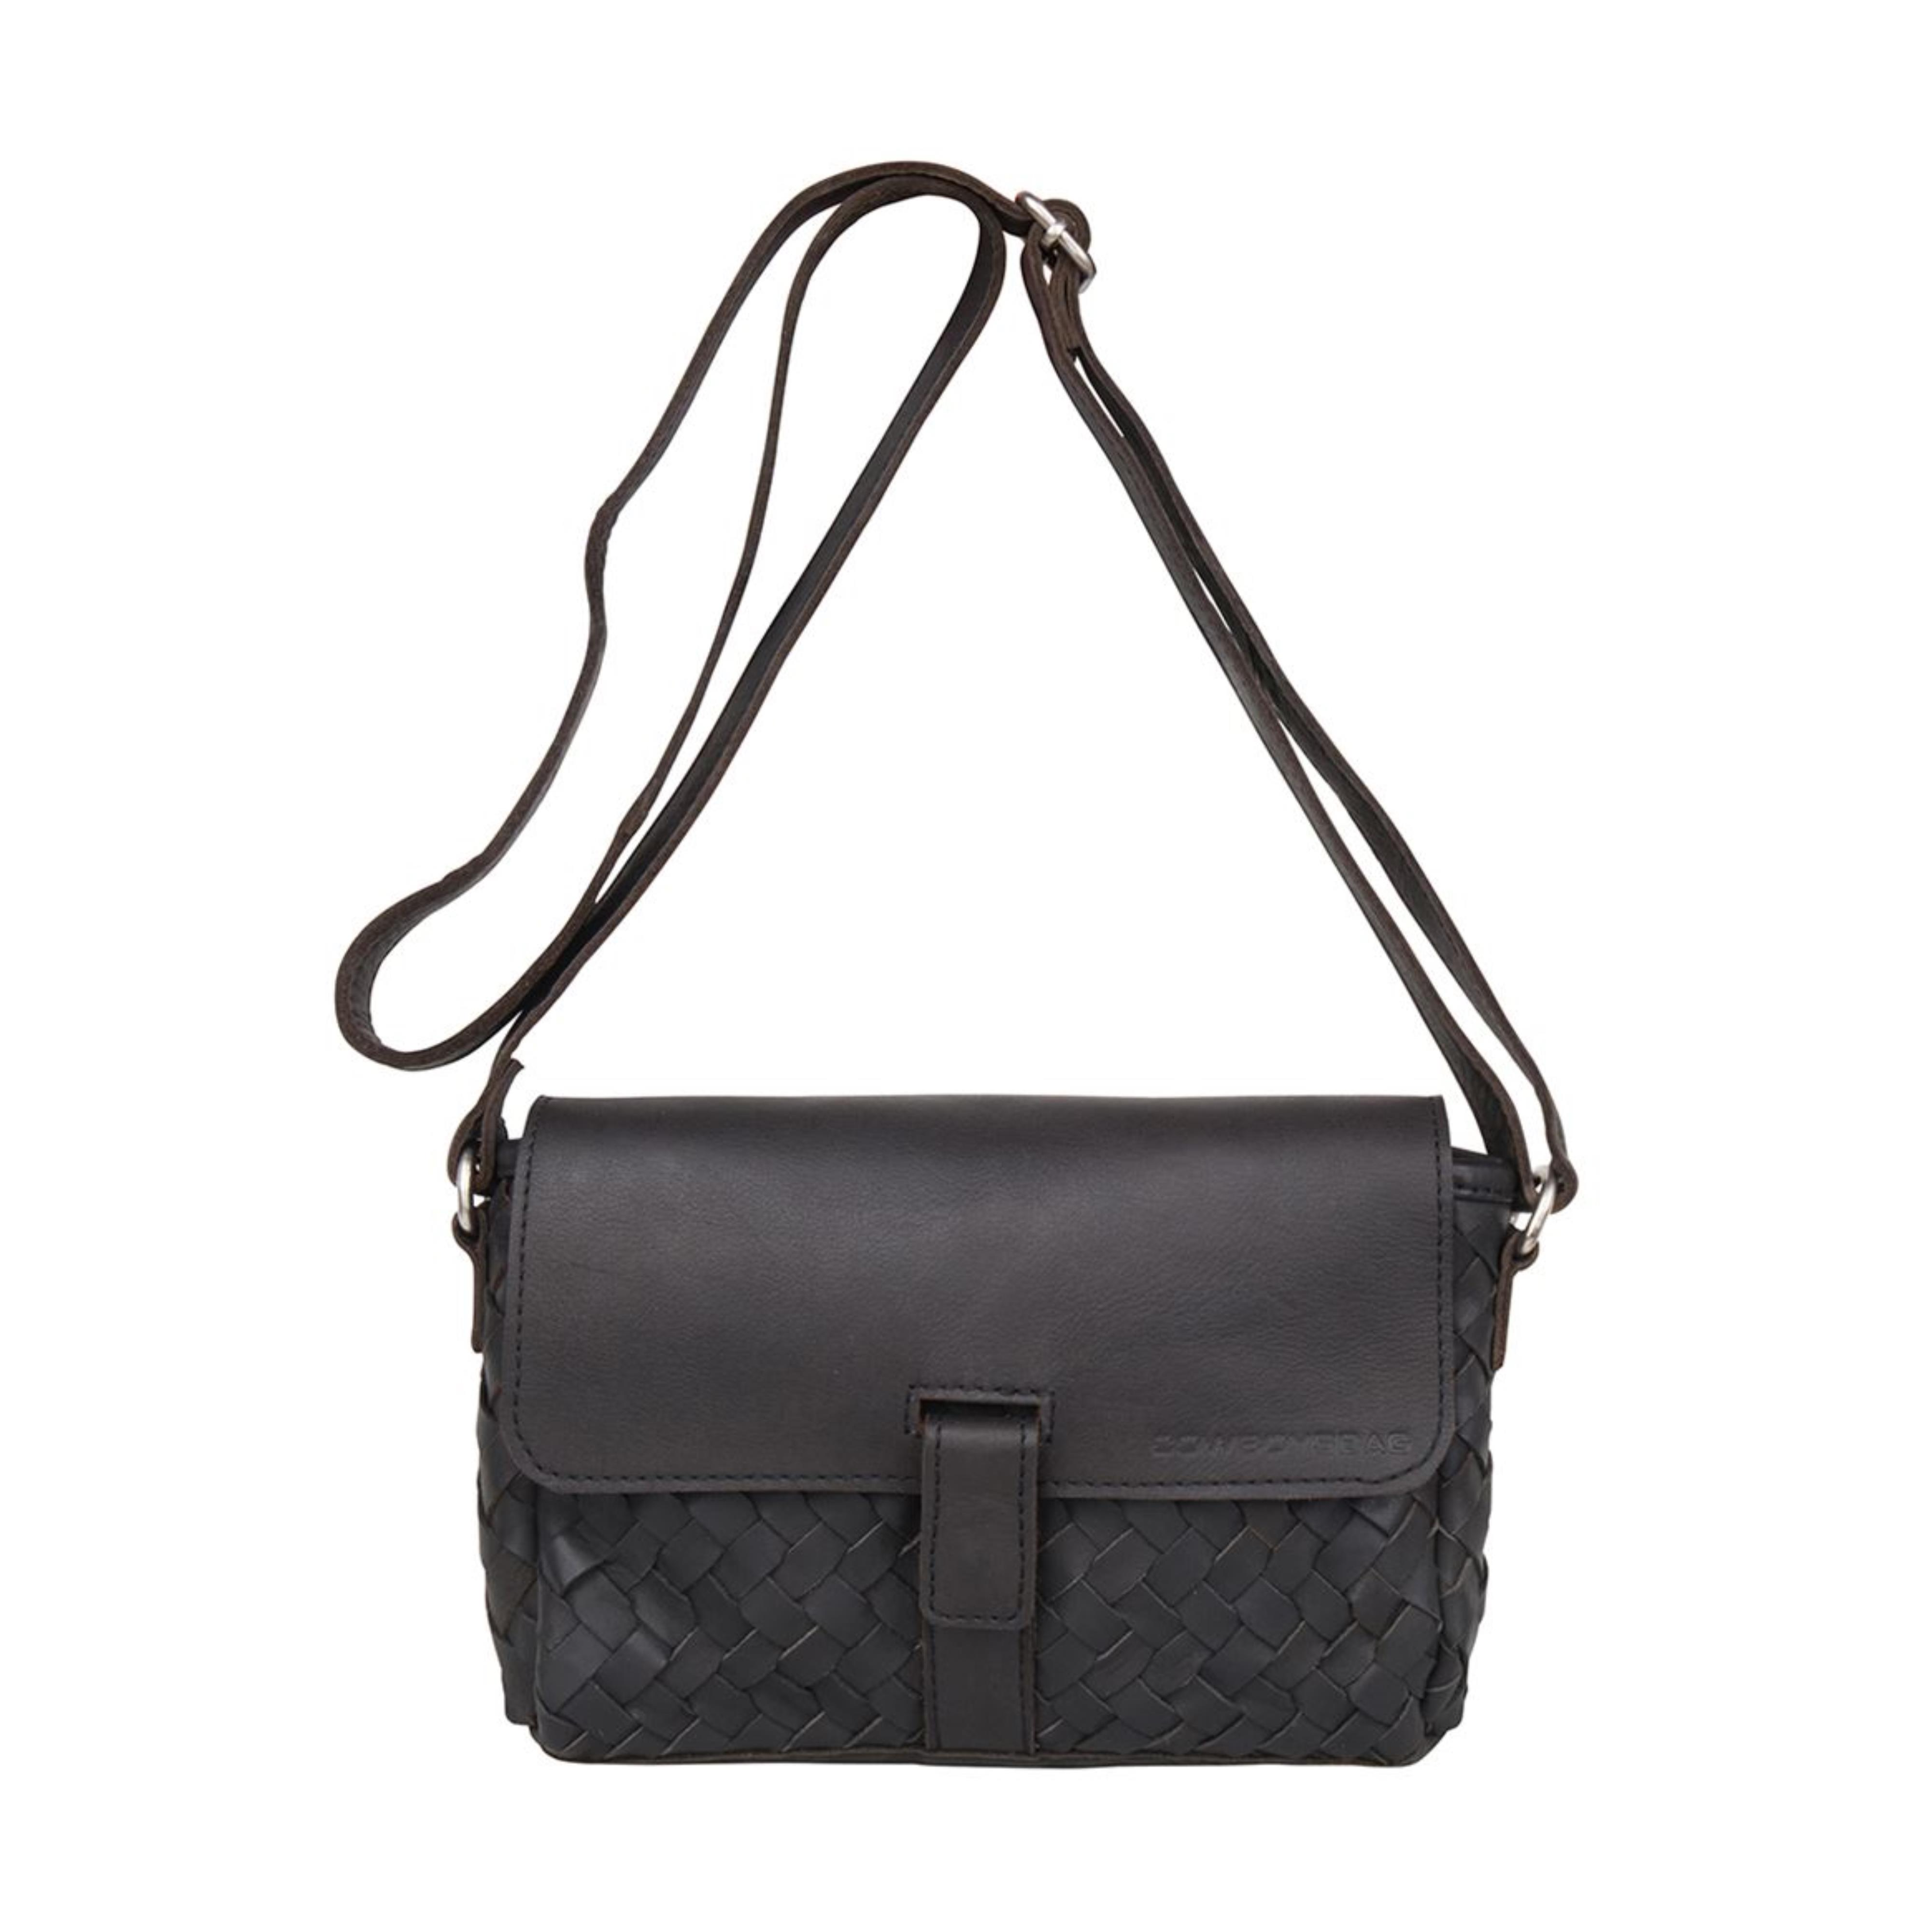 f4c9dc2bd1d2e COWBOYSBAG Damen Tasche Umhängetasche Bag Hardly Black Schwarz 2086 001 ...